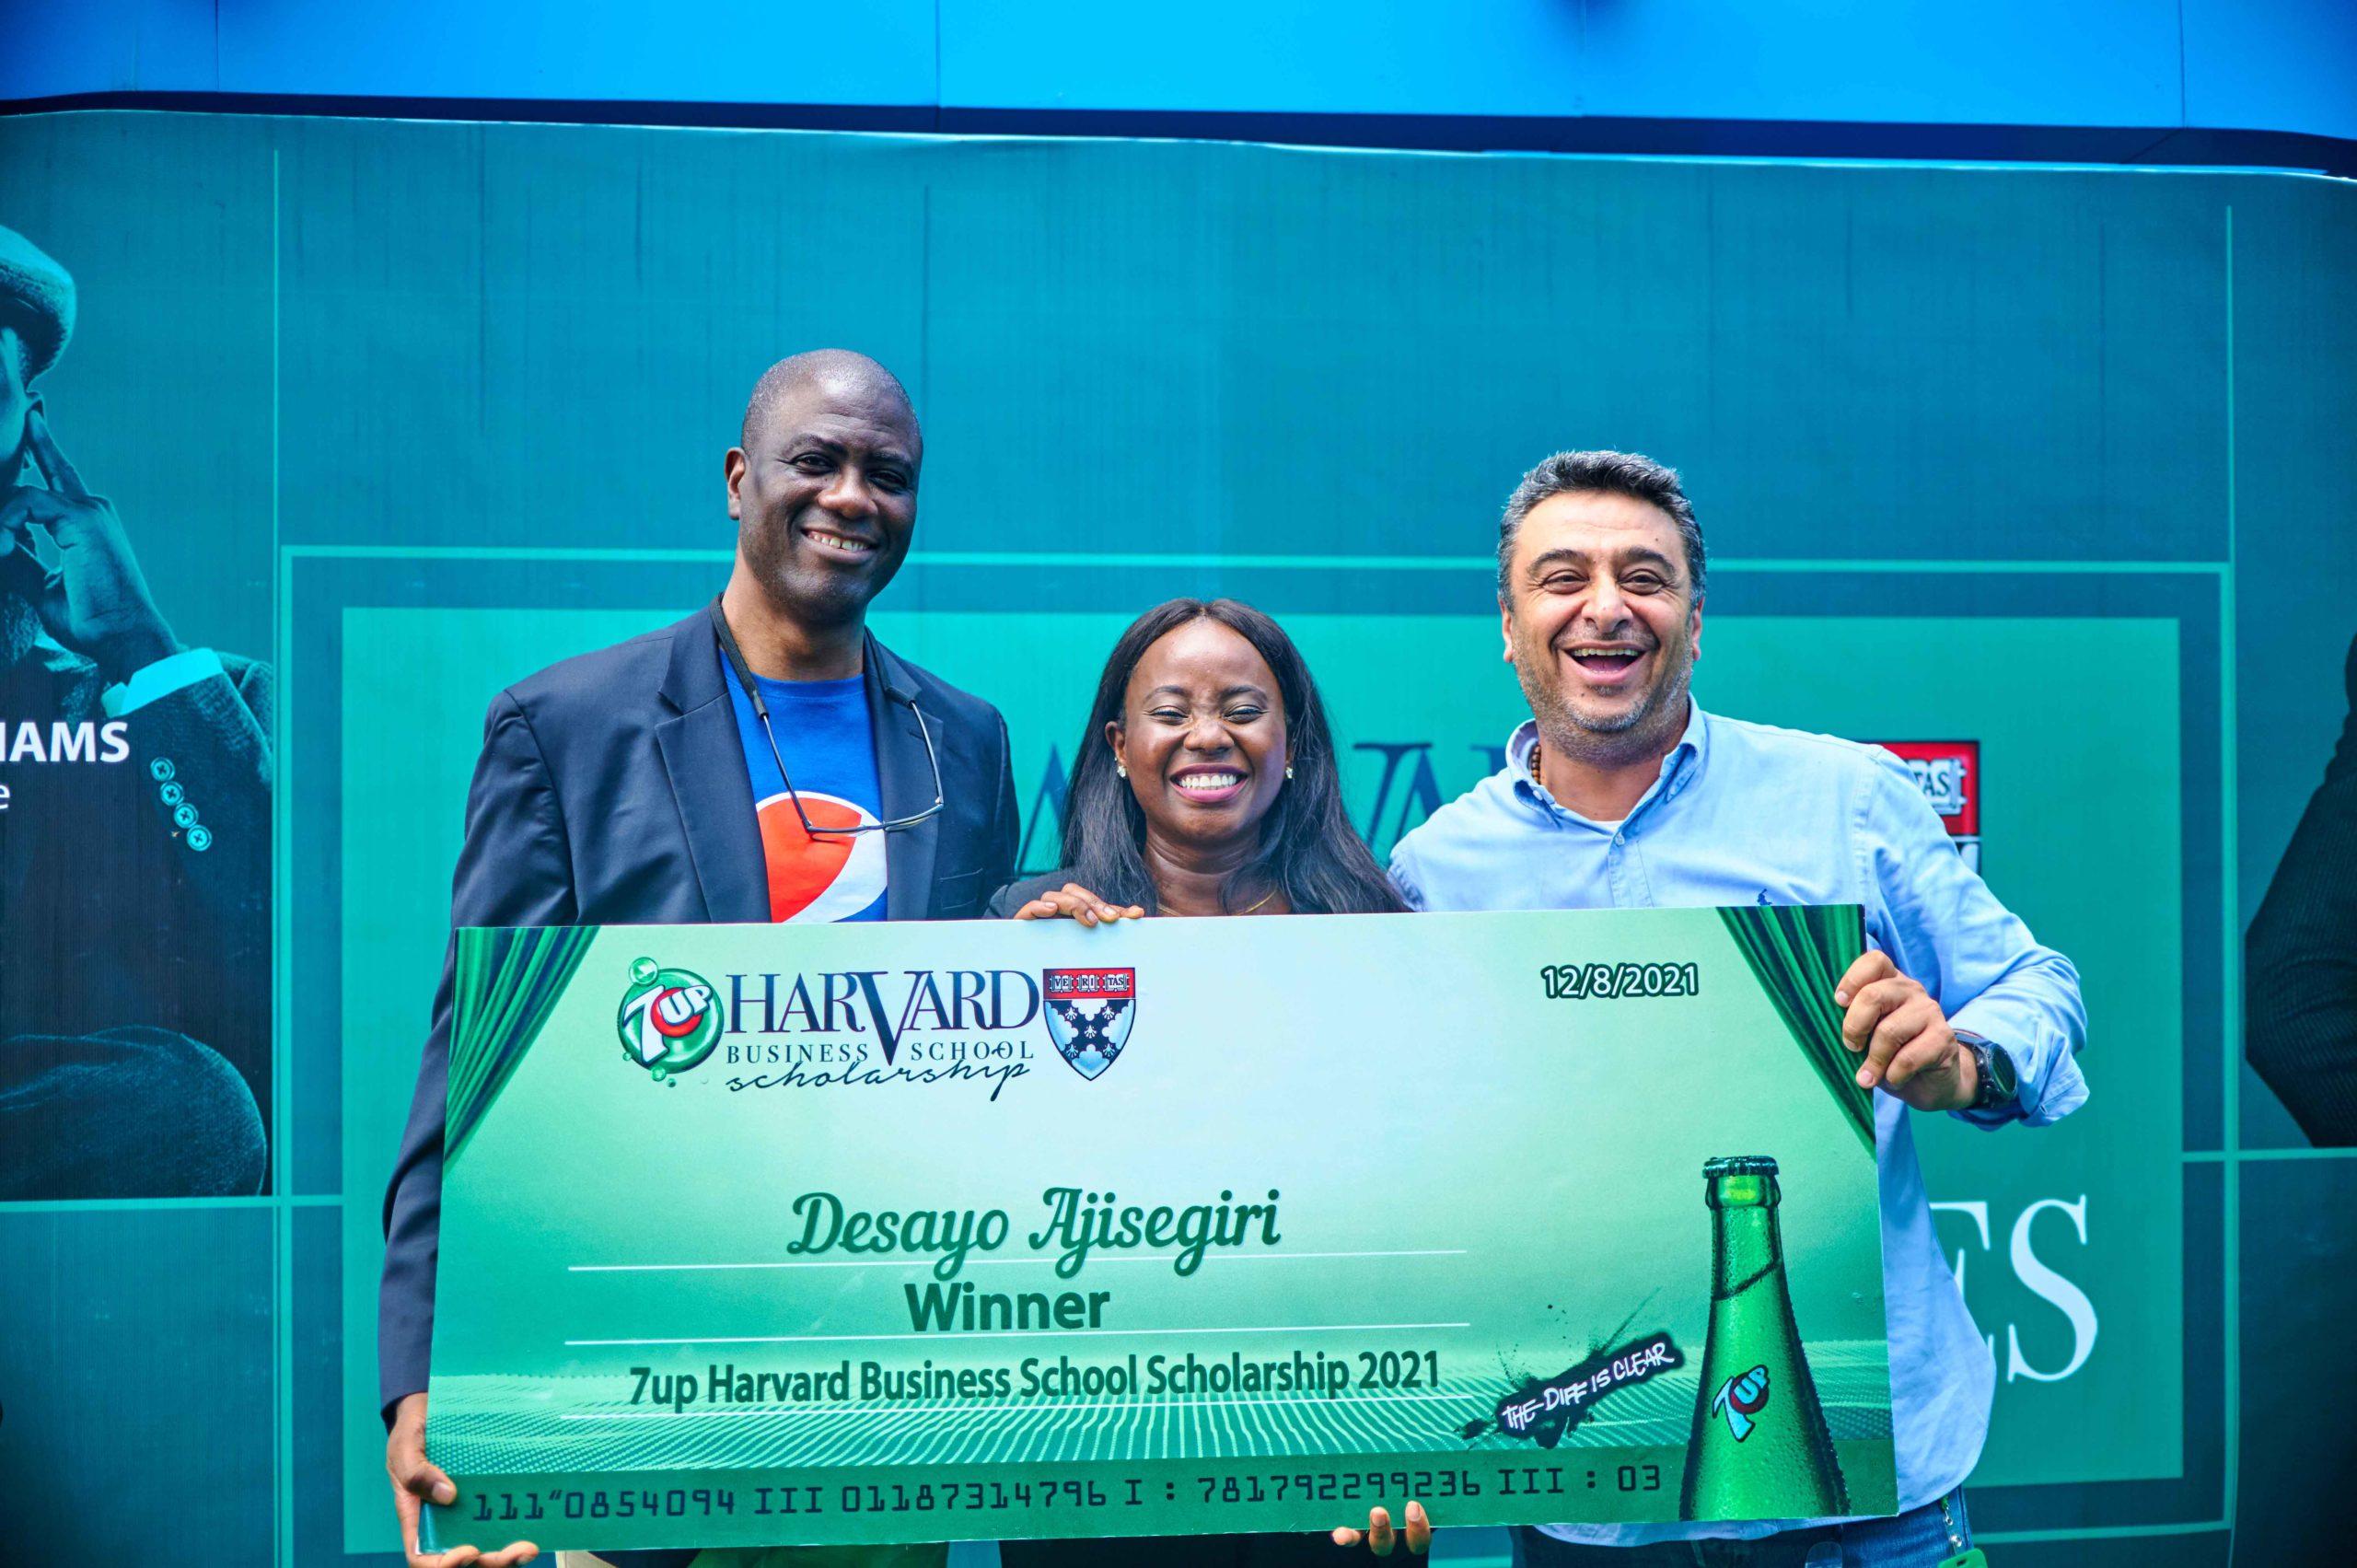 L-R Yemi Faseun, Chief Corporate Services Officer, SBC, Nigeria; Desayo Ajisegiri, Winner, 2021 7UP Harvard Business School Scholarship; and Ziad Maalouf, MD, SBC Nigeria